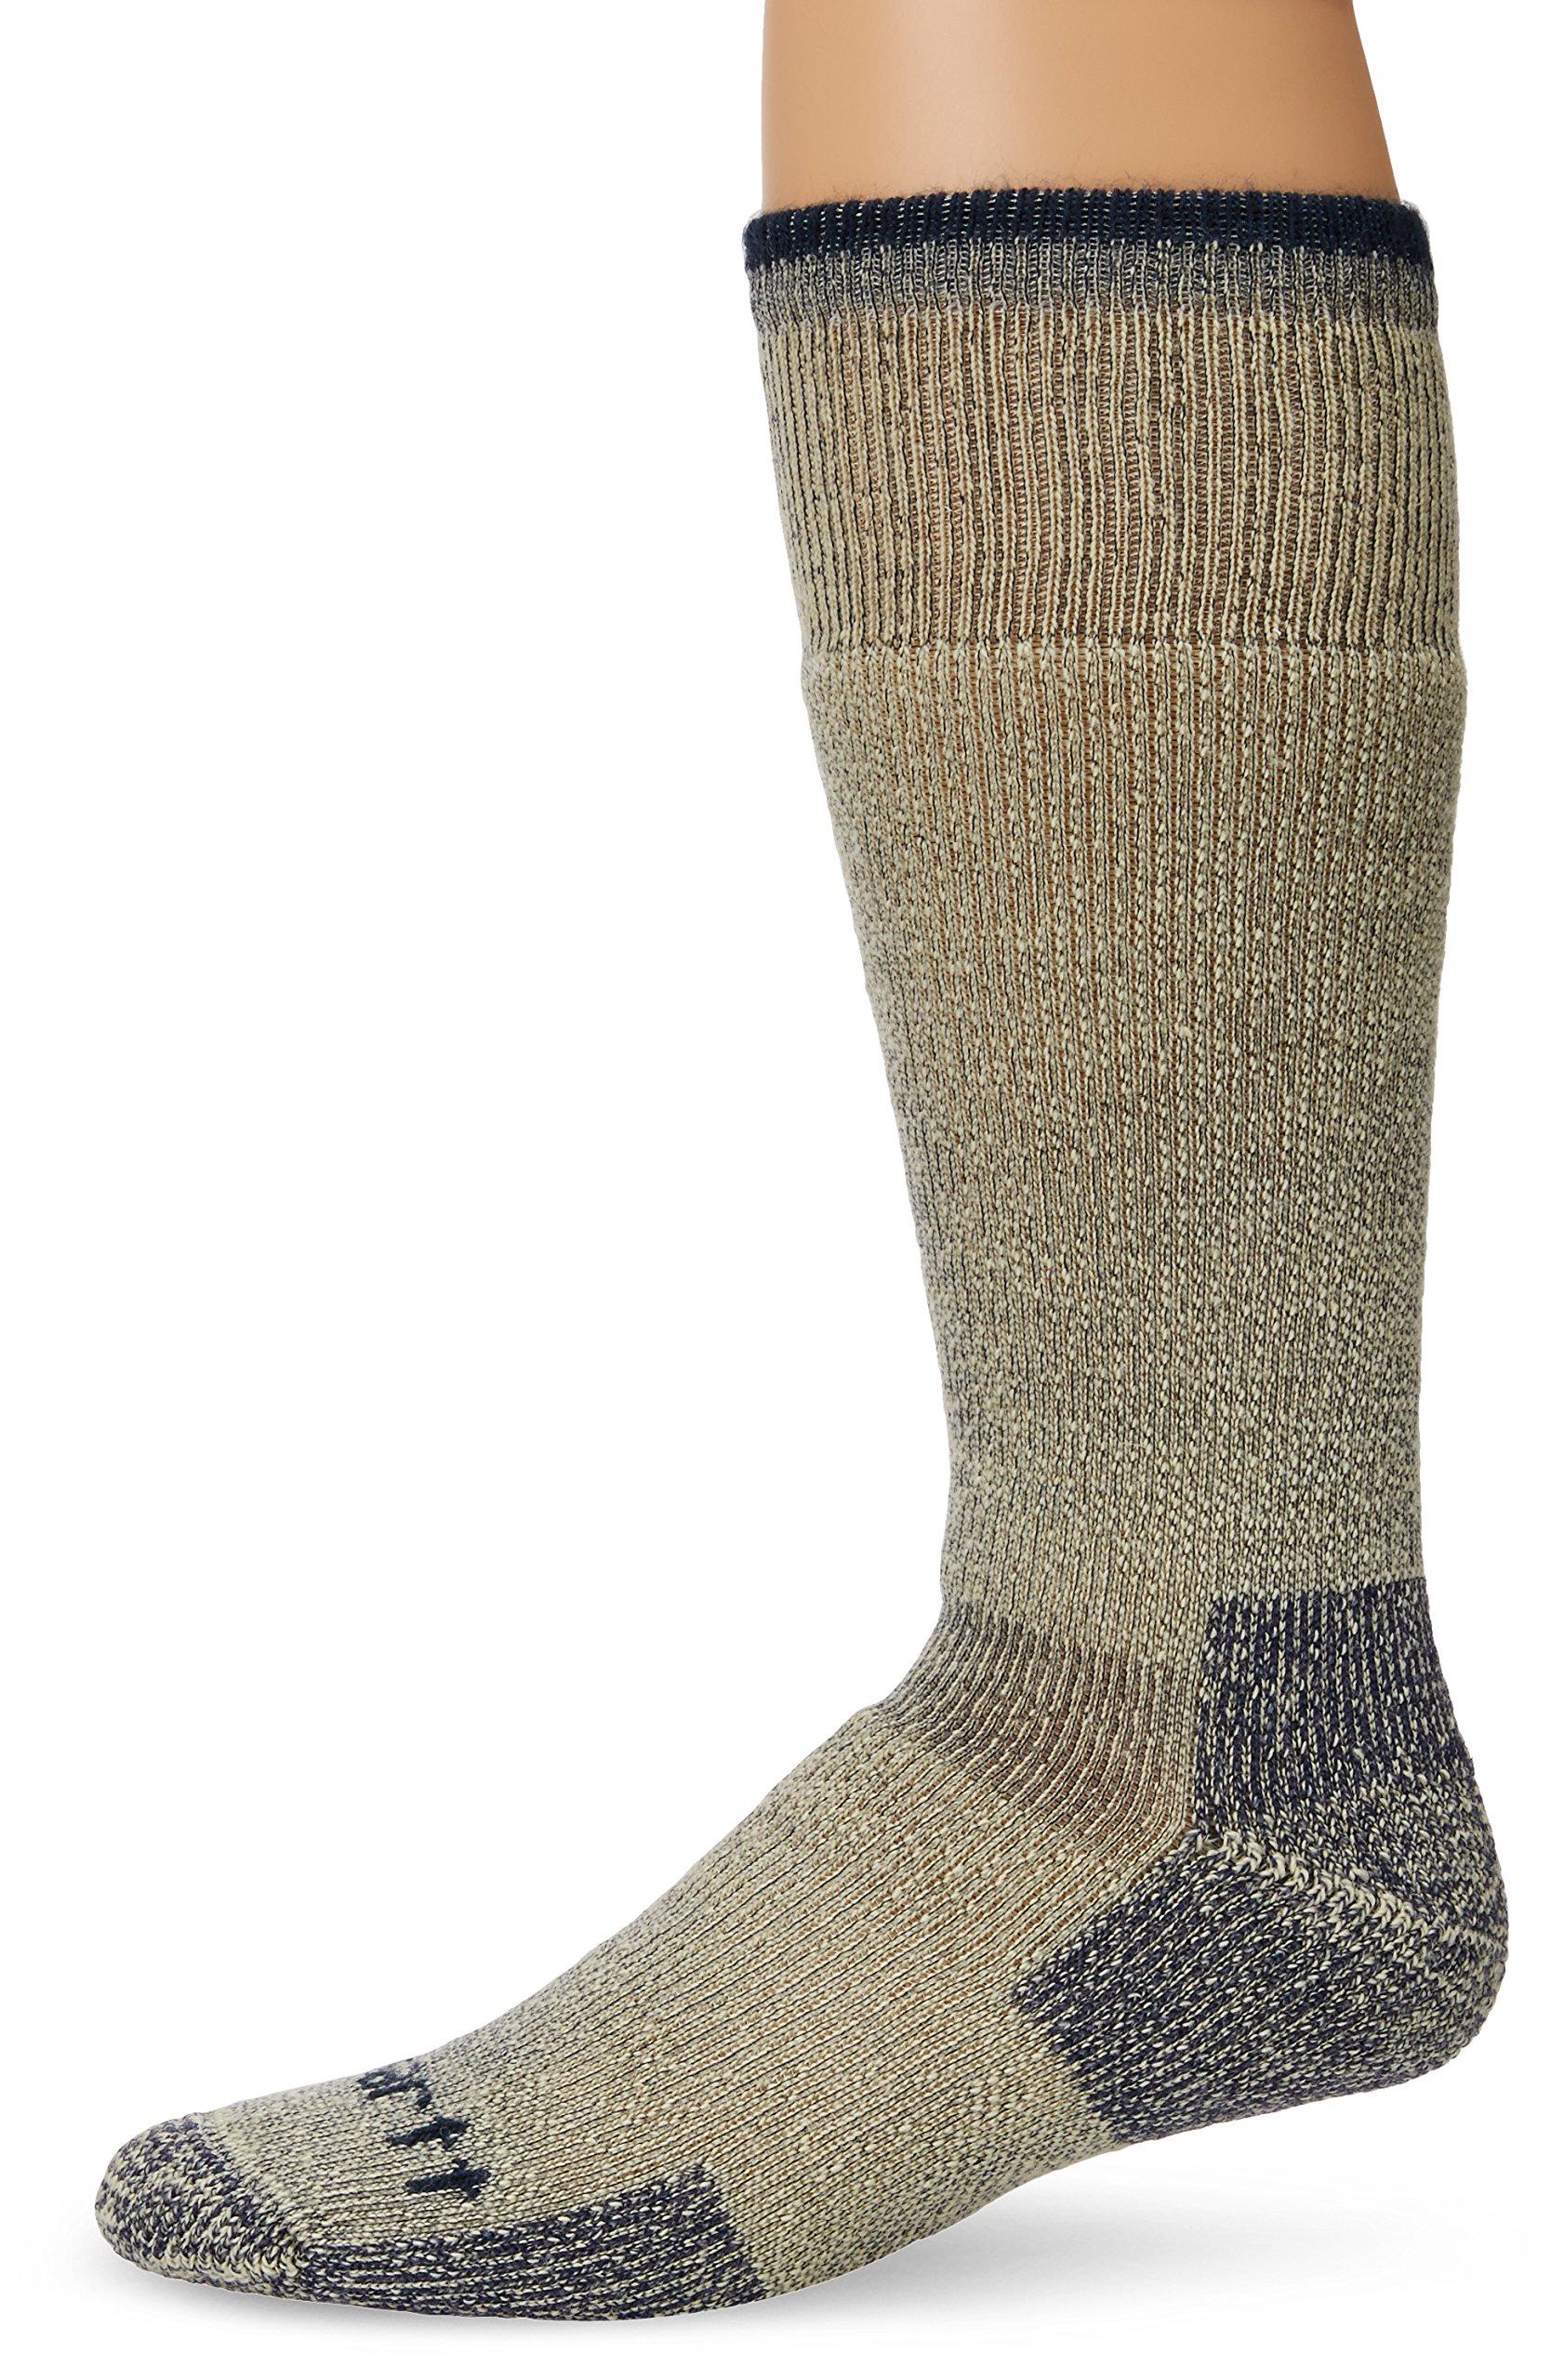 Carhartt Men's Arctic Wool Heavyweight Boot Socks - Shoe: 11-15 - Navy